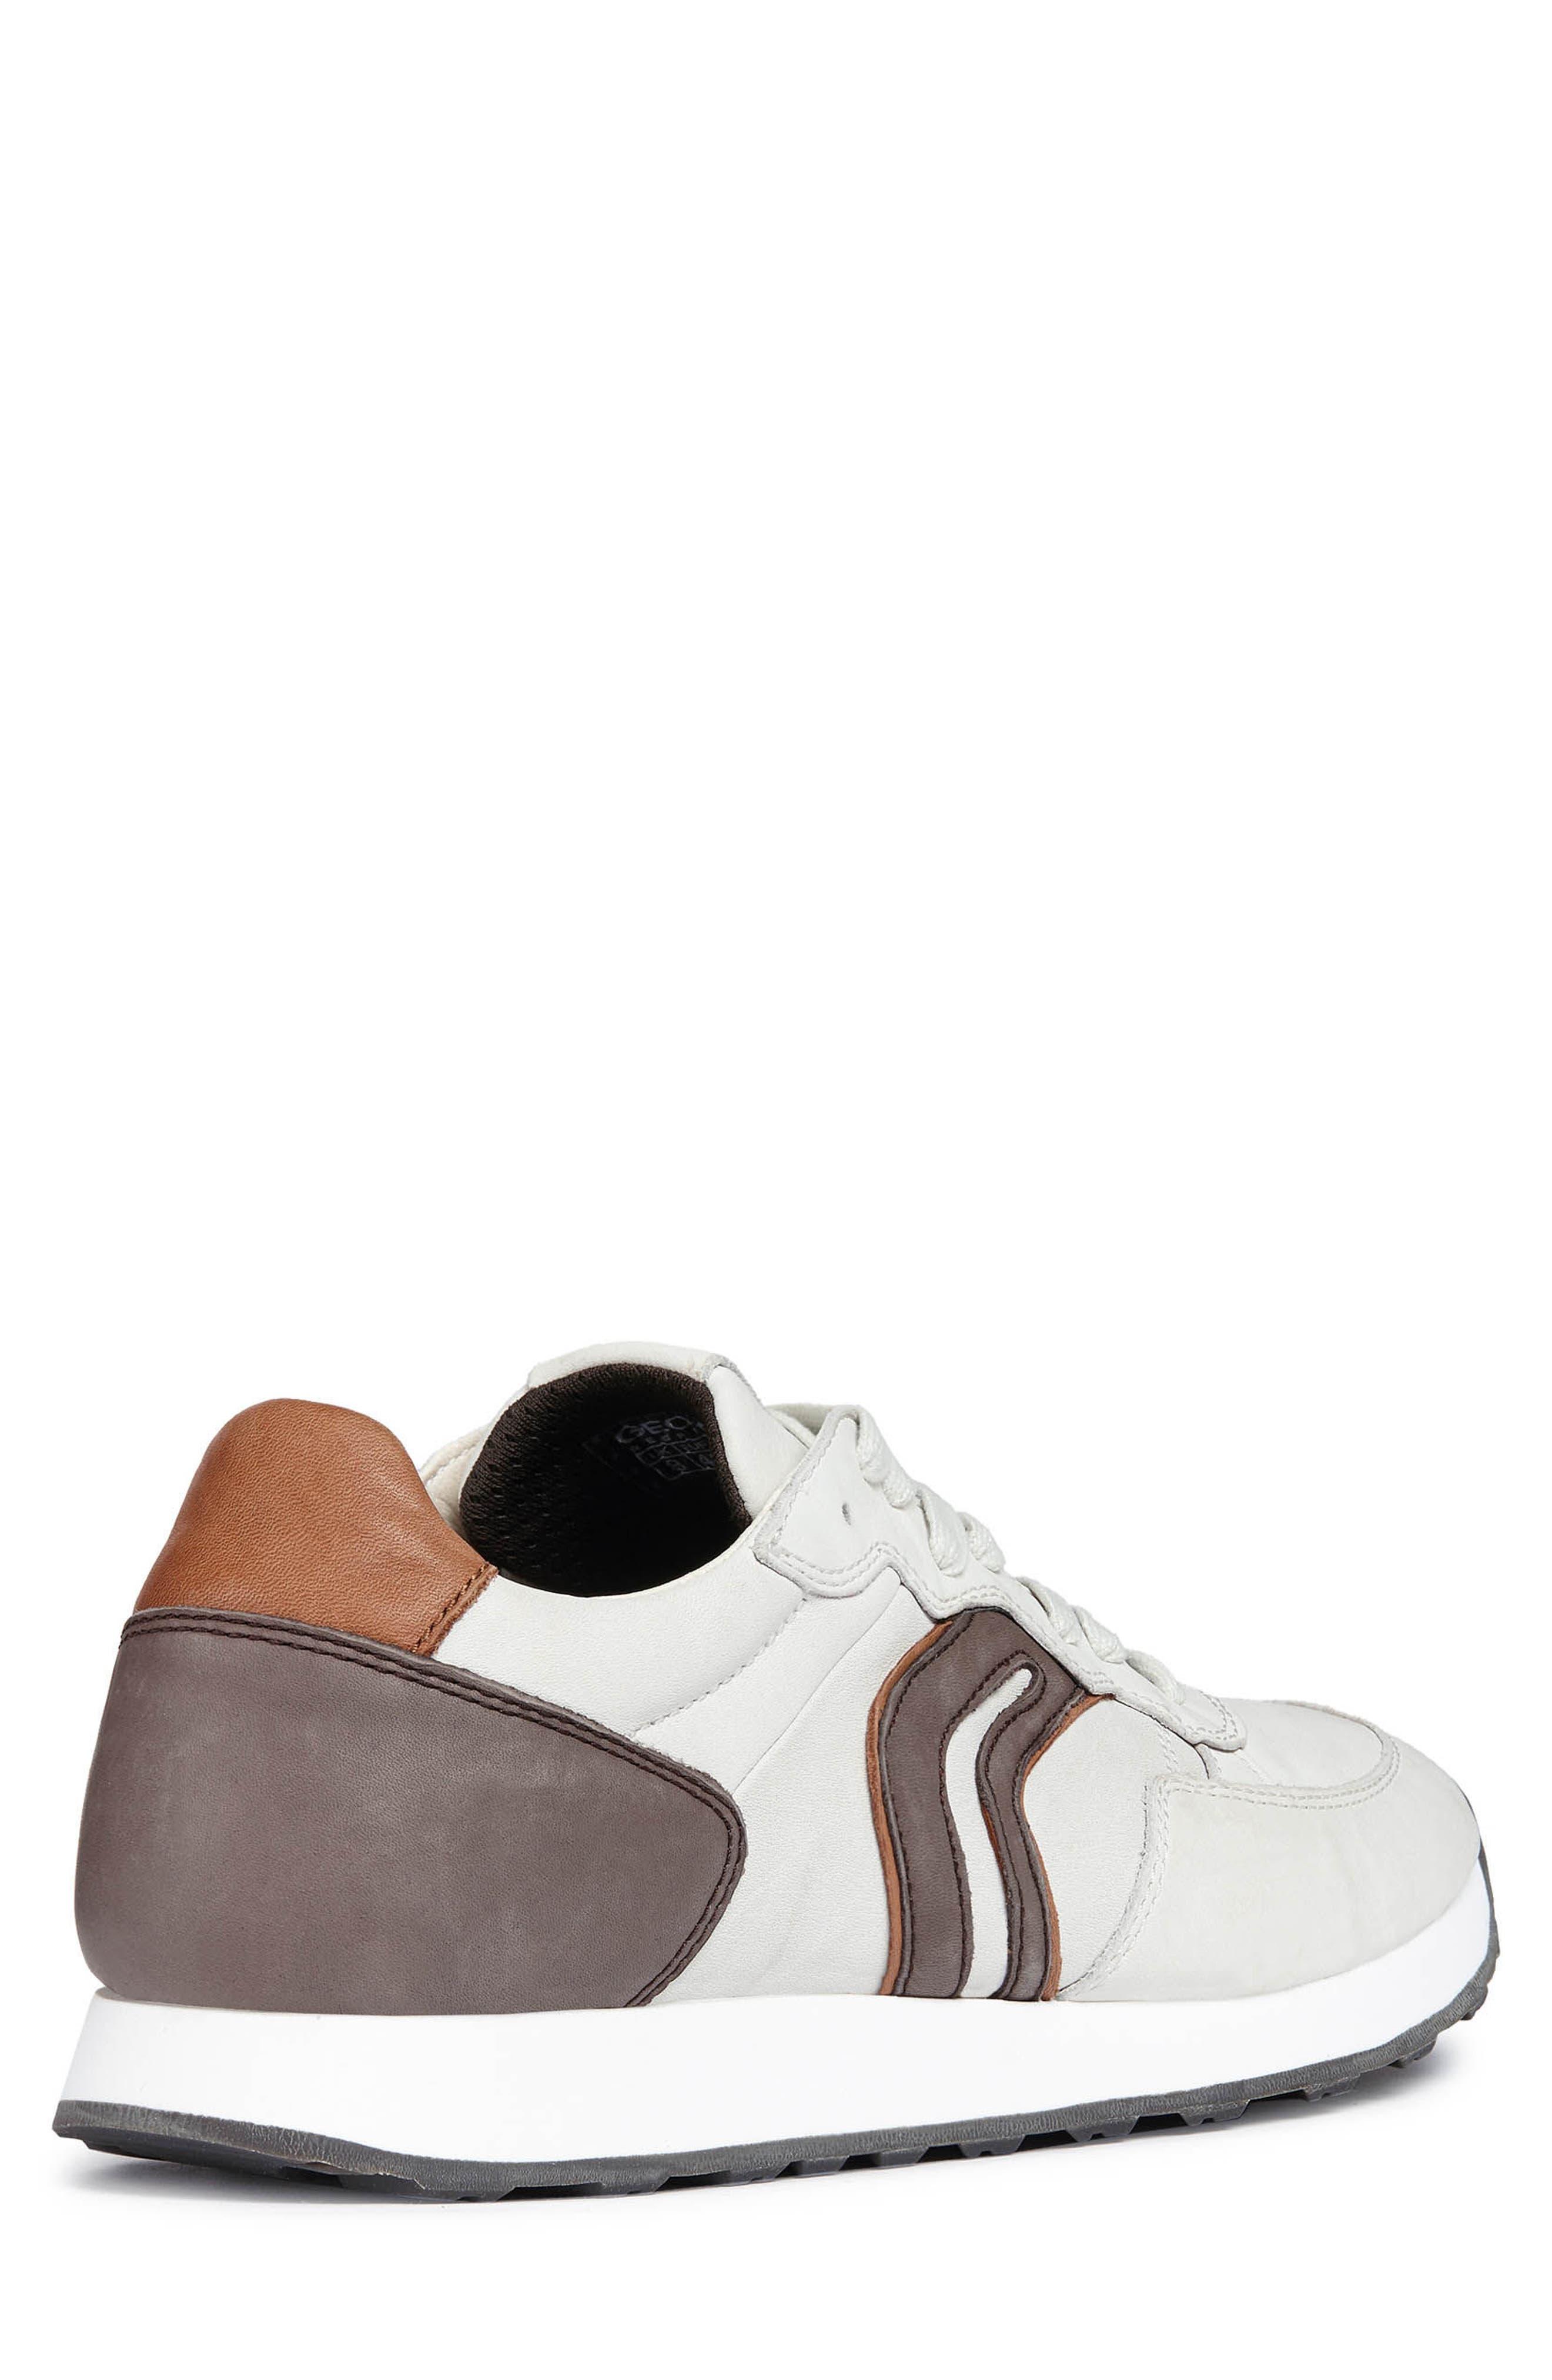 Vincint 1 Sneaker,                             Alternate thumbnail 2, color,                             WHITE/ DARK COFFEE LEATHER